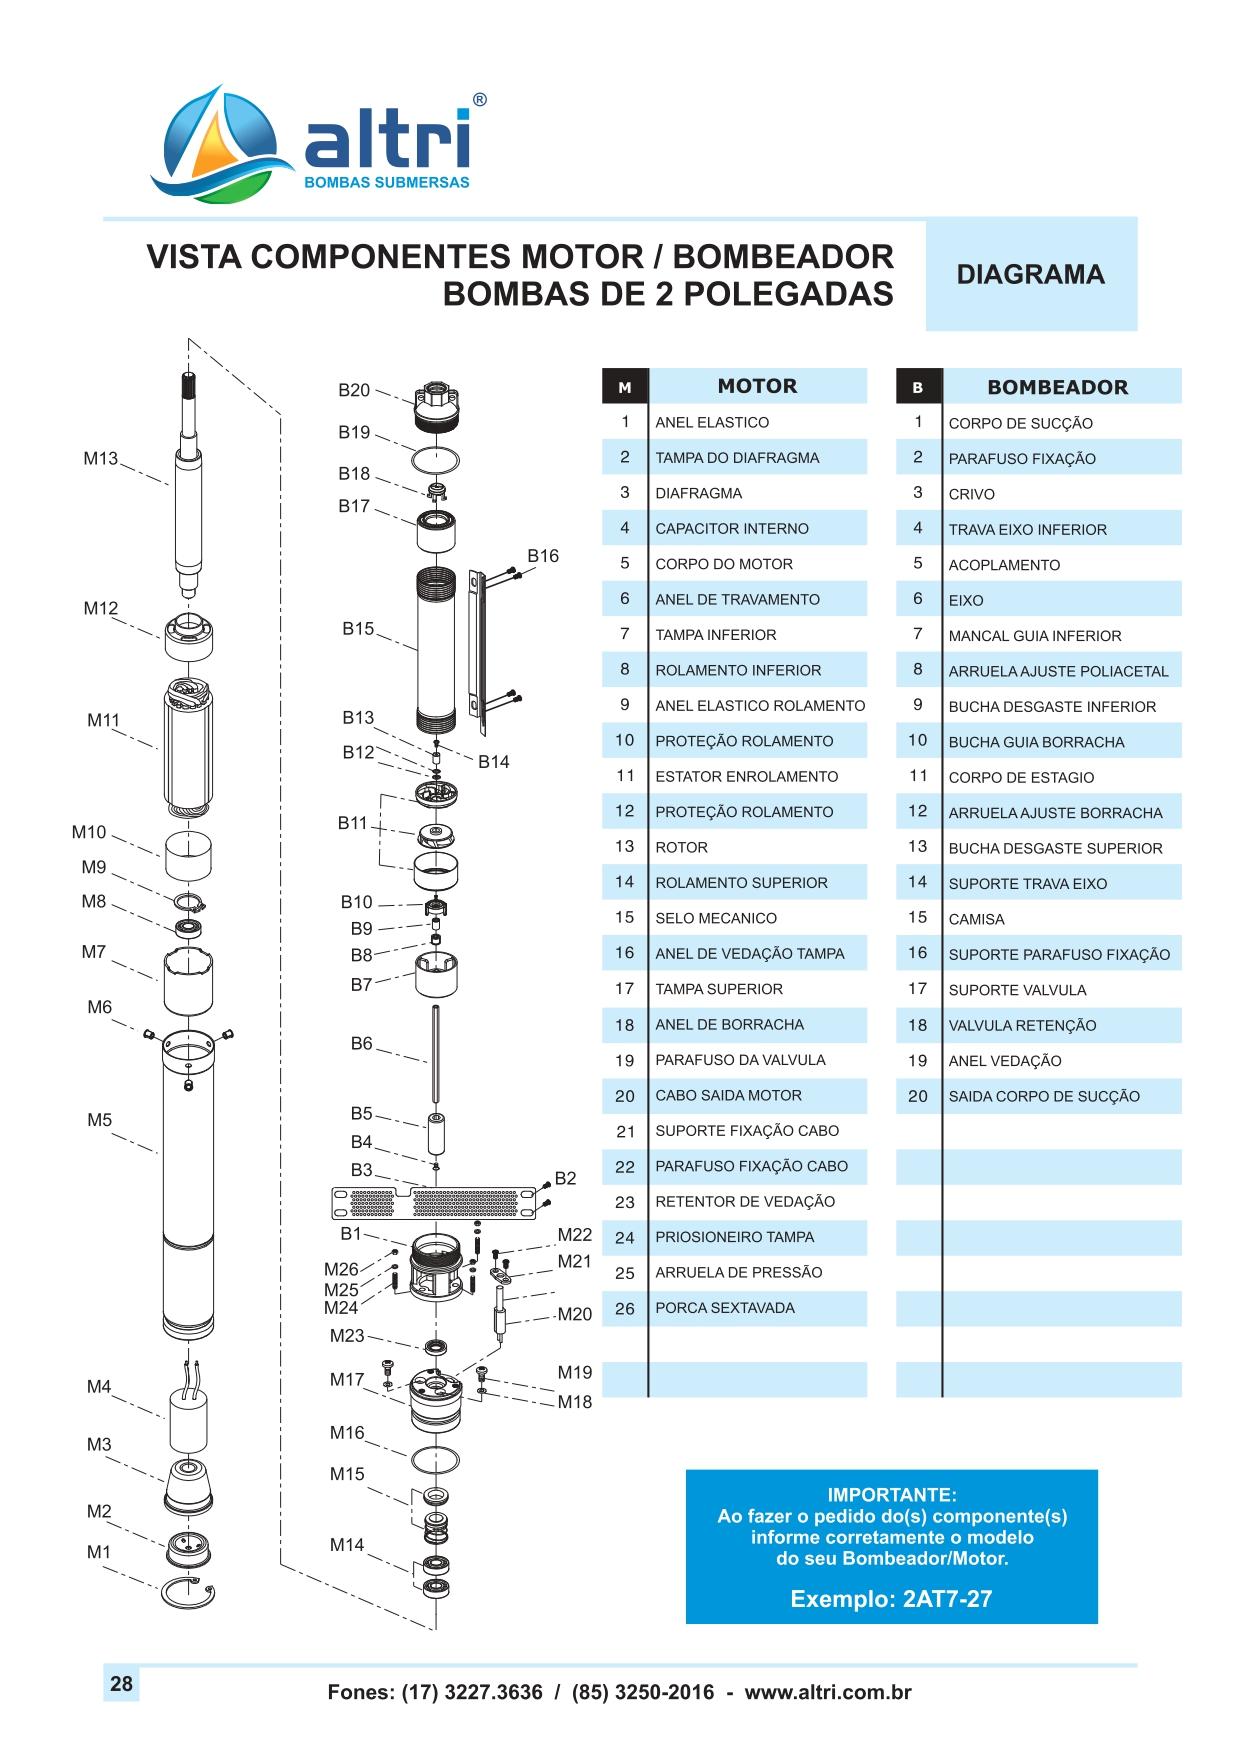 CATALOGO DE PRODUTOS ALTRI 2021 - WEB_page-0030